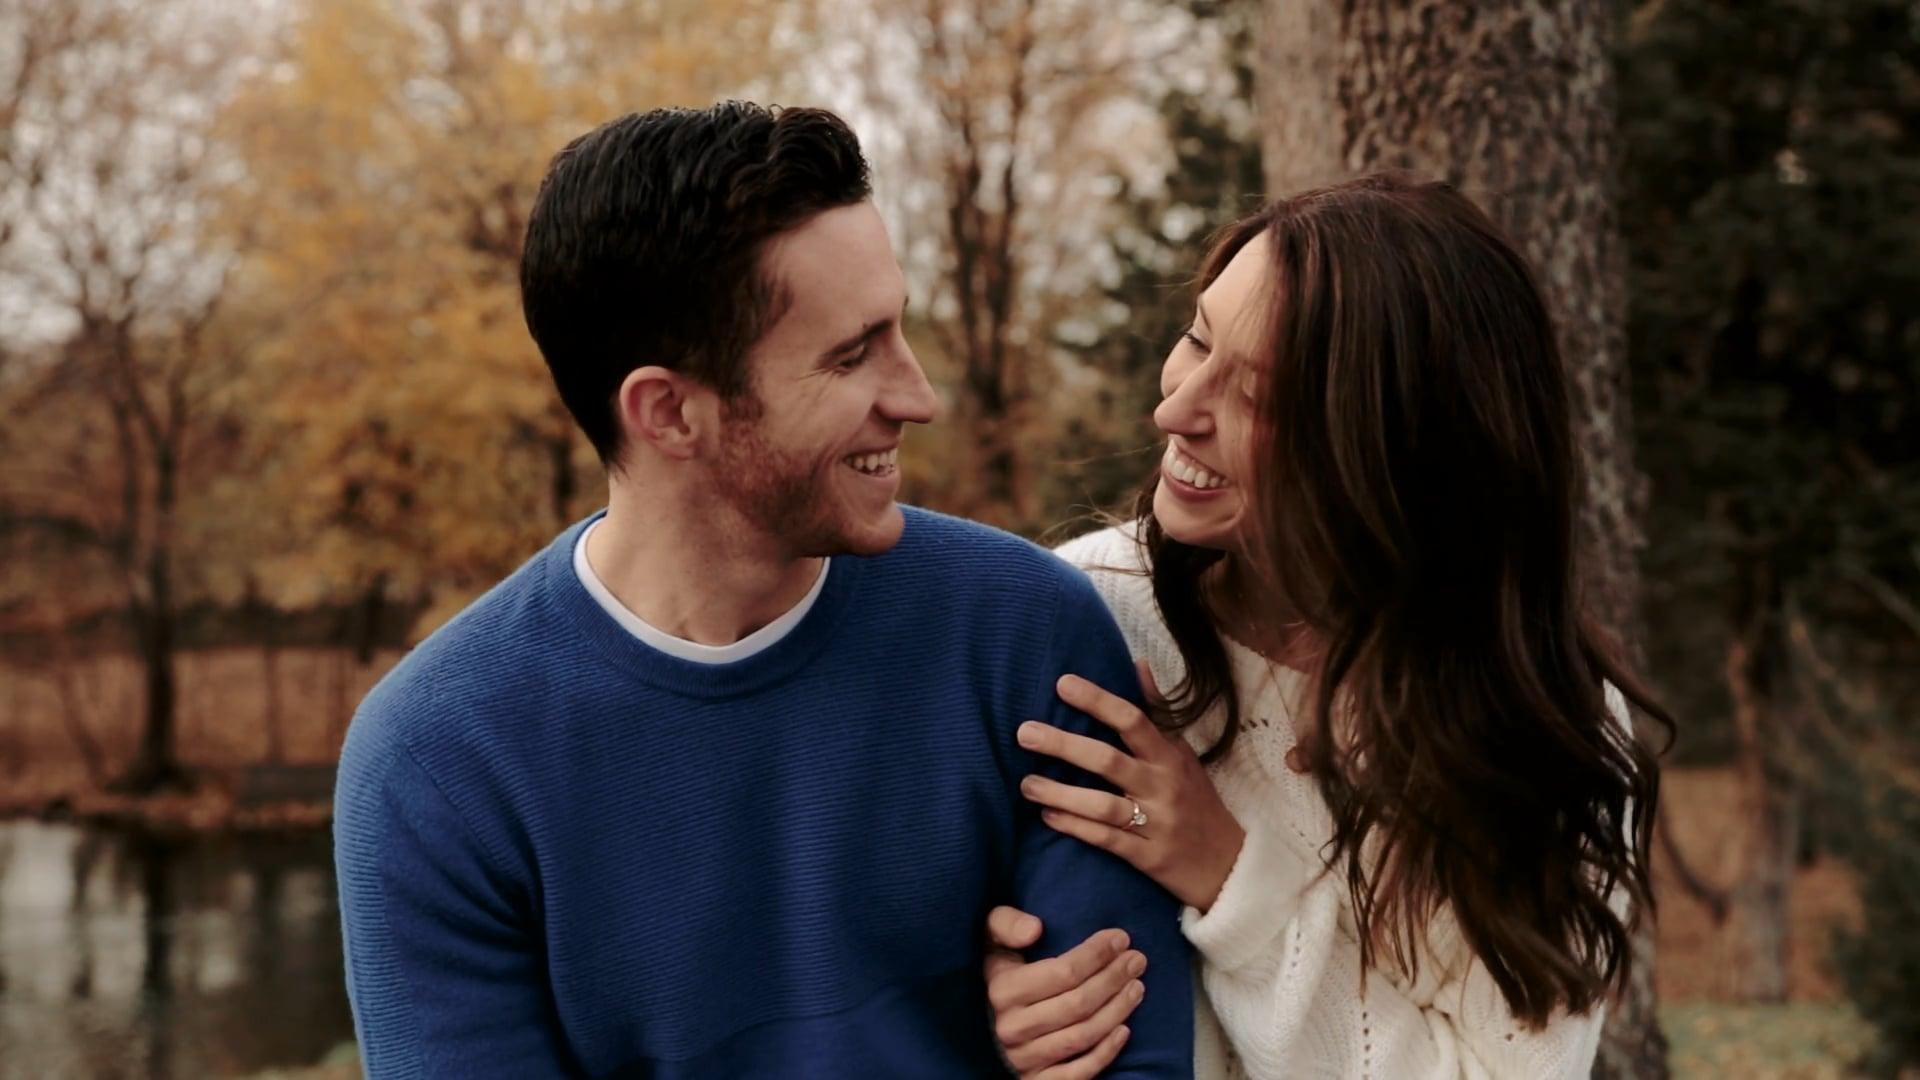 Halie + Addison | Engagement Film